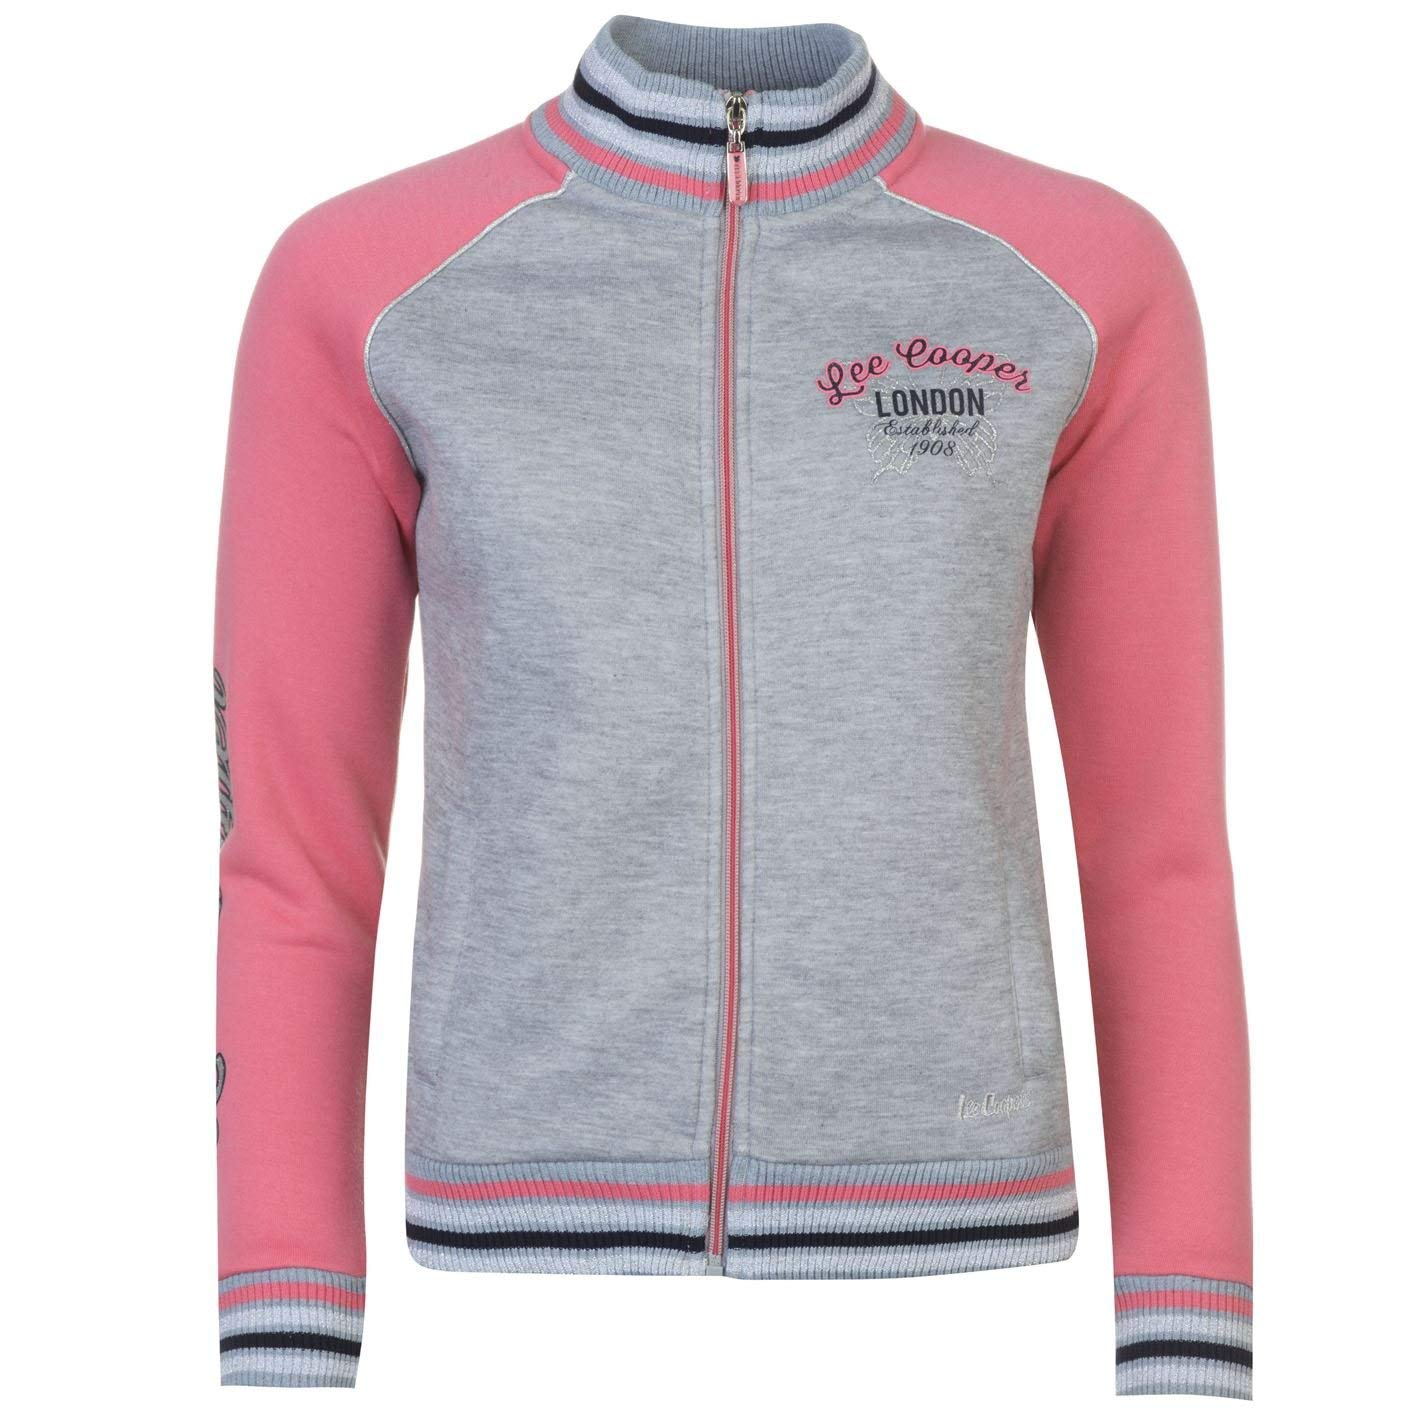 1694ba86 Get Quotations · Lee Cooper Womens Glitzy Zipped Jacket Full Zip Sweater  Coat Top Jumper Pullover Grey M/